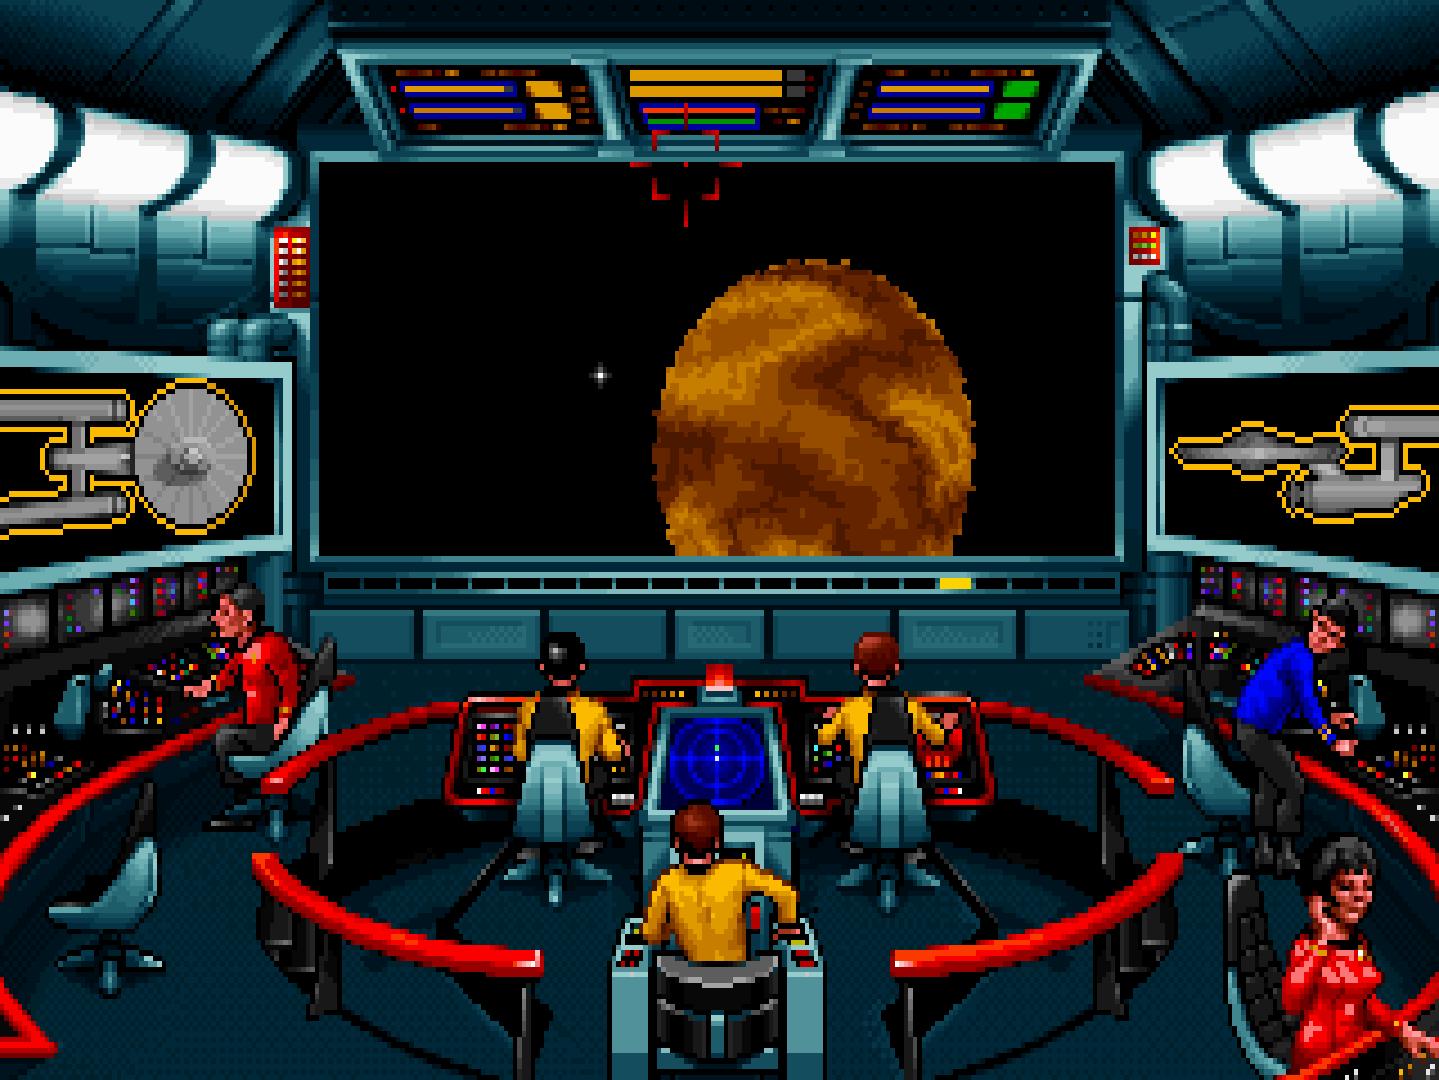 The iconic bridge of the Enterprise.